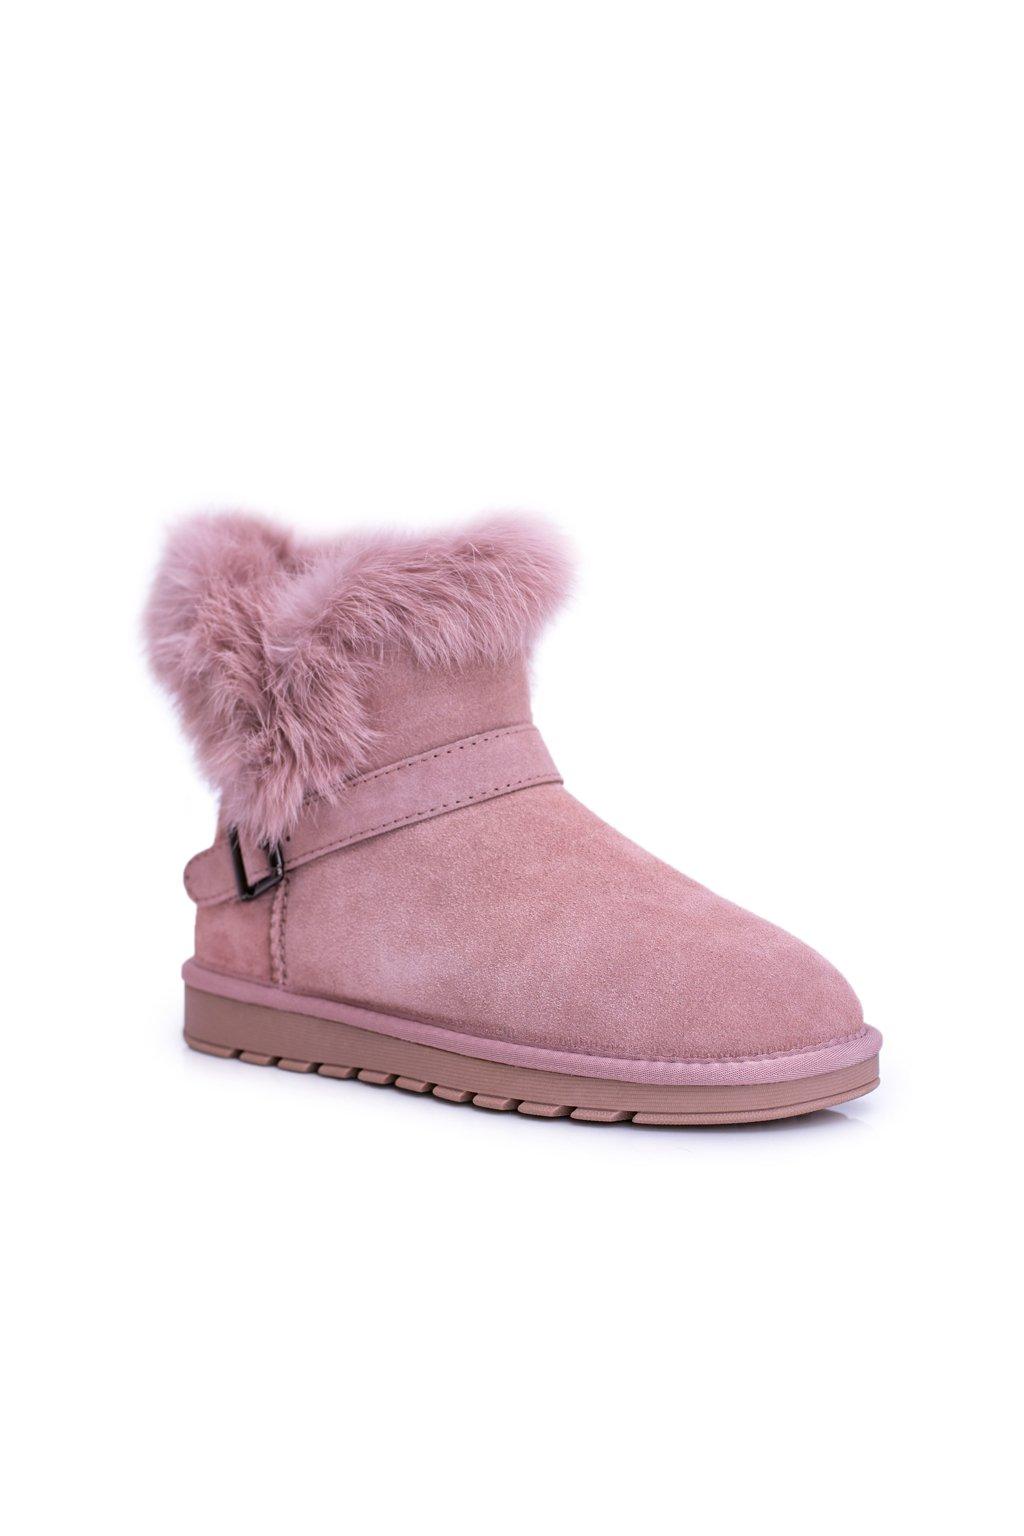 Dámske snehule farba ružová kód obuvi W8001 PINK